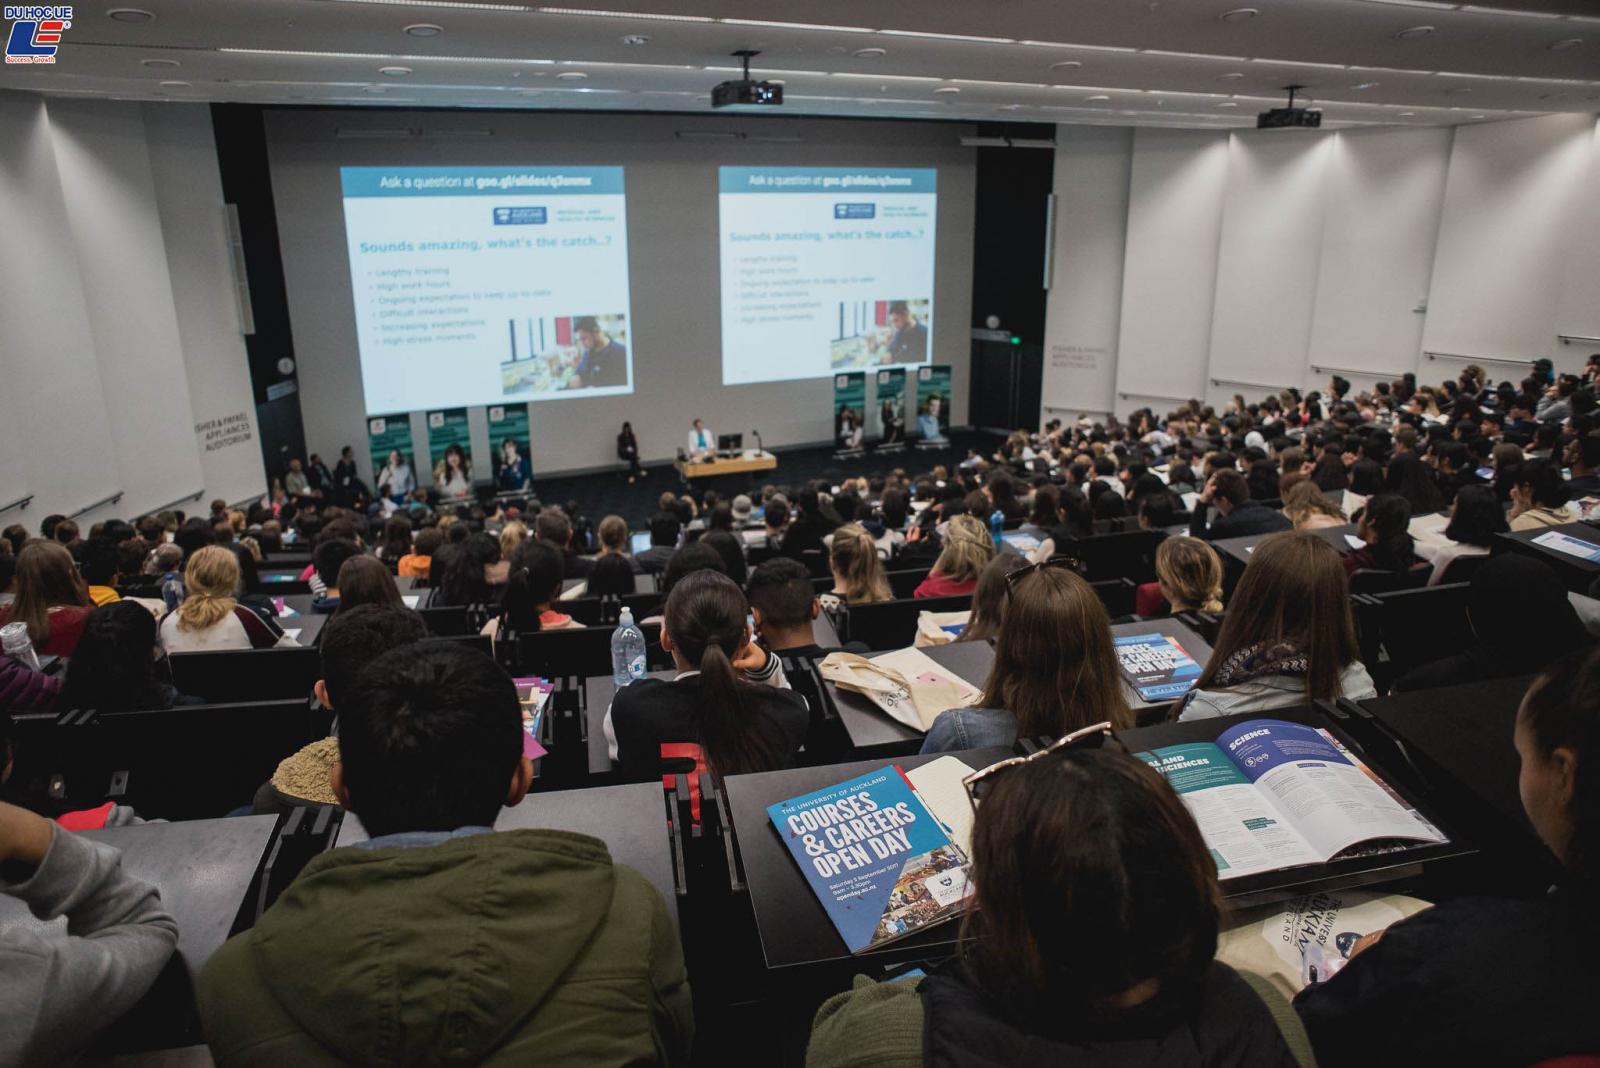 Du học New Zealand - Tổng quan về giáo dục New Zealand 3